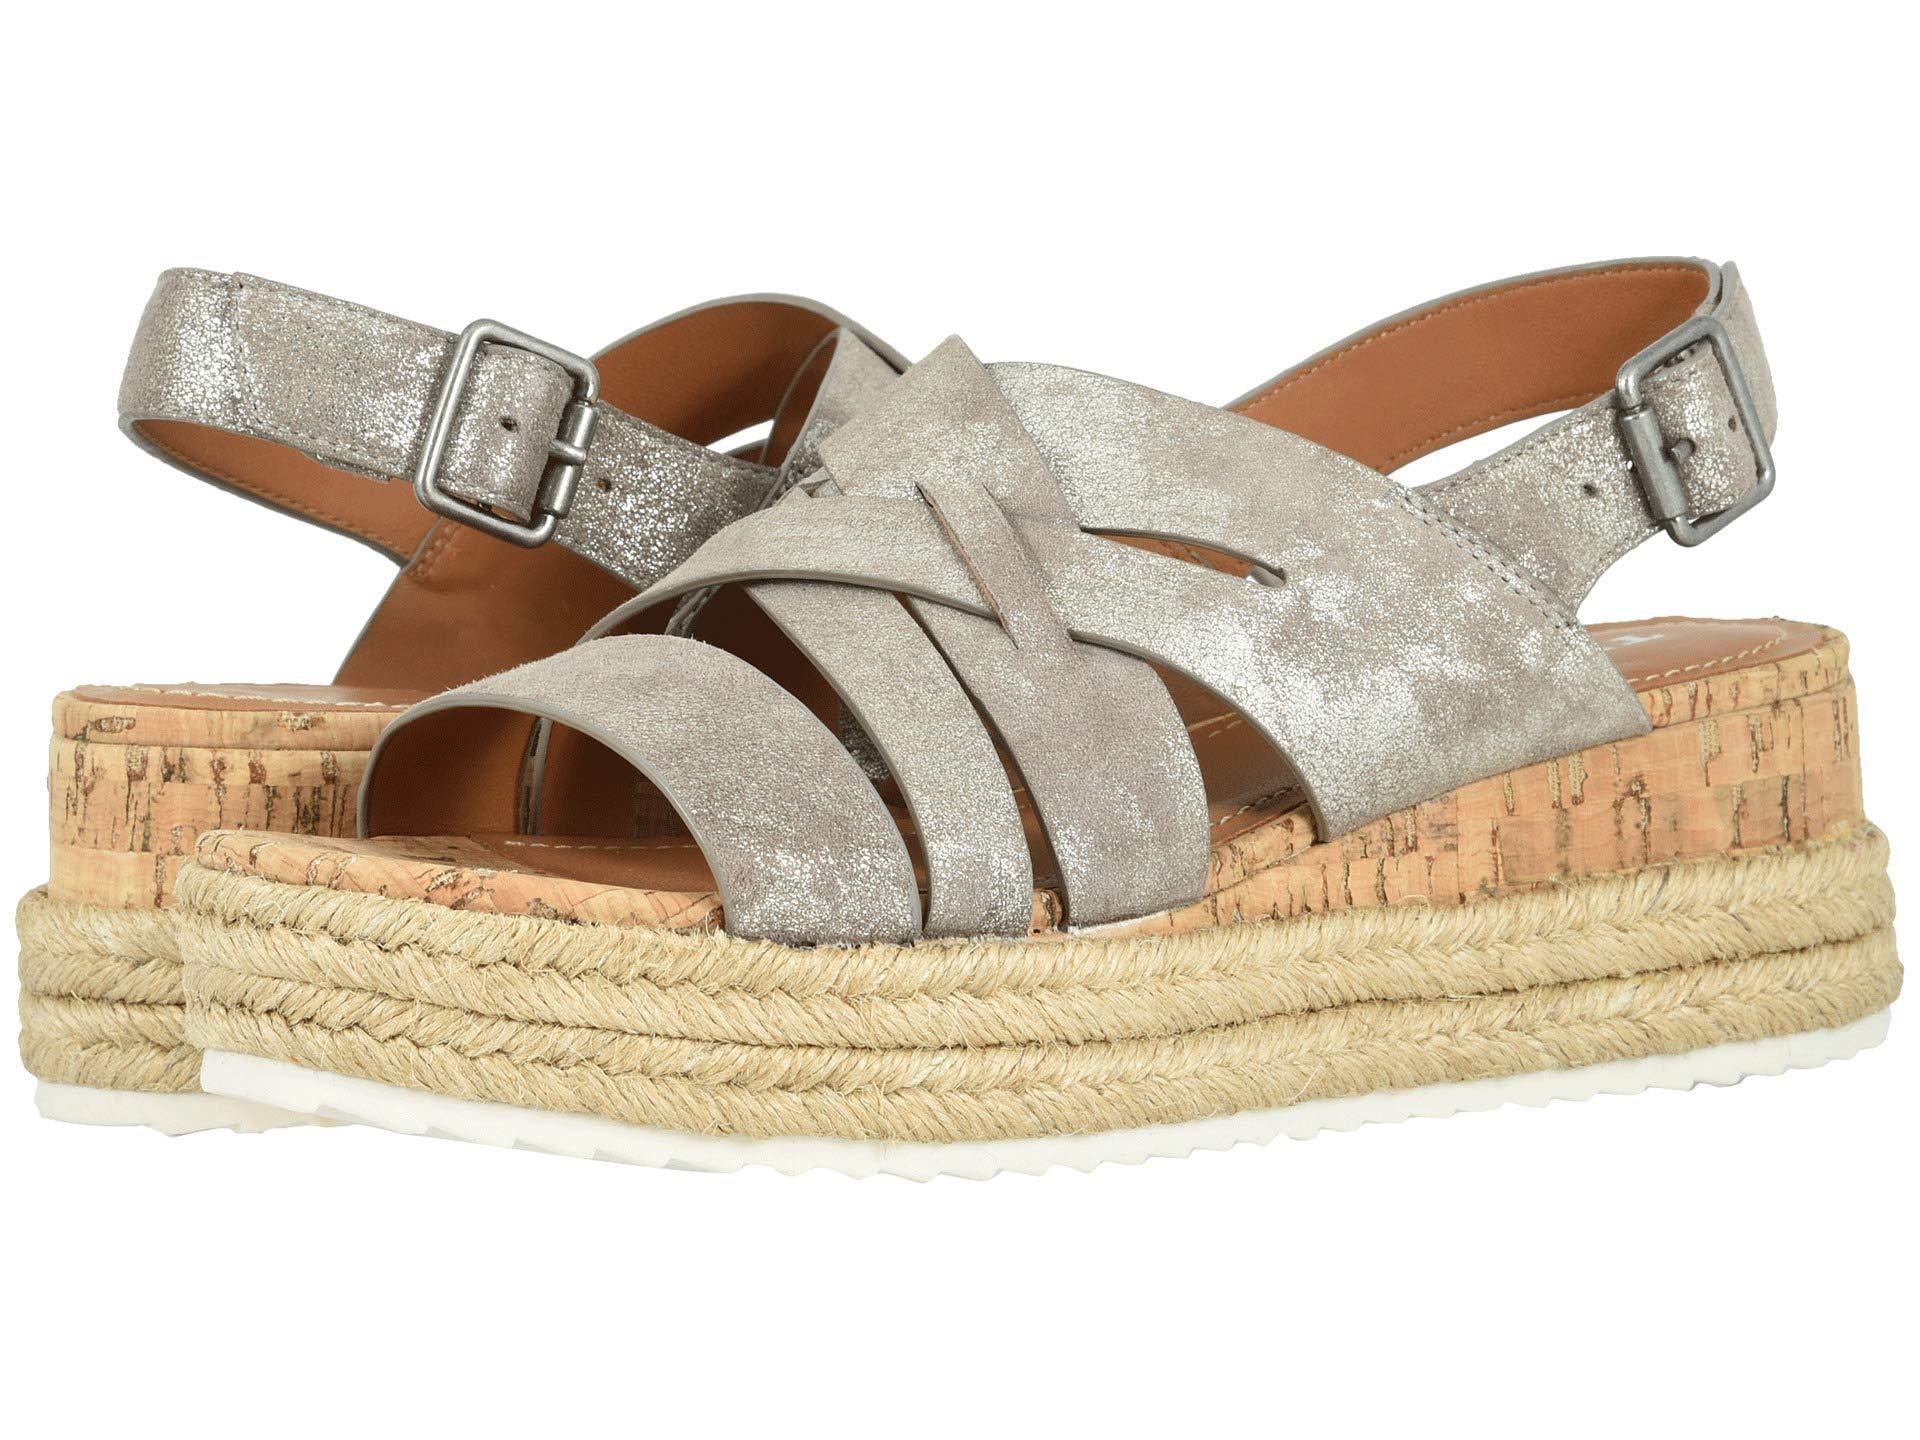 d6084f66ba412d Lyst - Trask Randi (navy Oiled Suede) Women s Sandals in Metallic